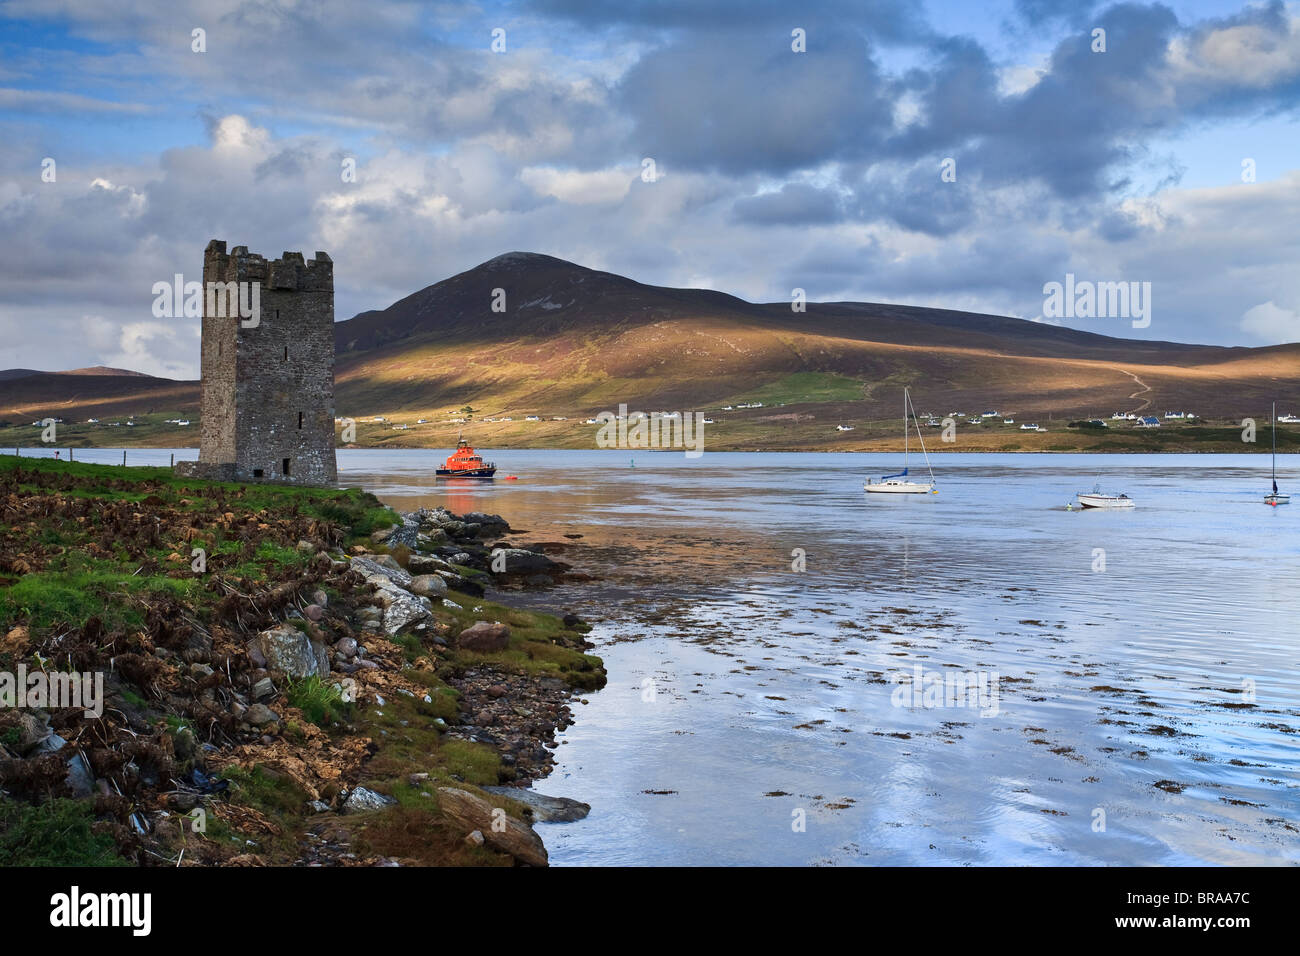 Dusk at Kildownet Castle, Achill Island, Ireland - Stock Image